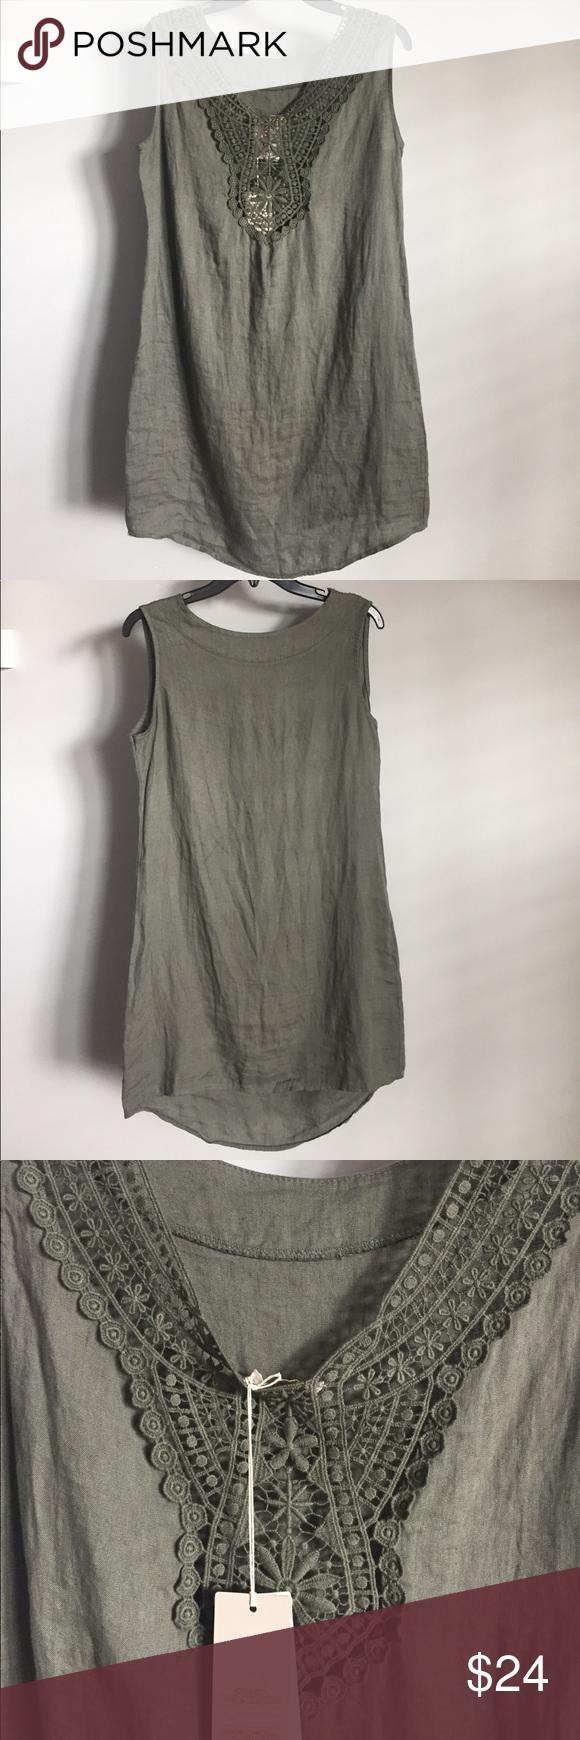 864f8d0000 Bellambra Italian Linen Dress Size XS Bellambra 100% Italian Linen Size XS  Lovely olive green